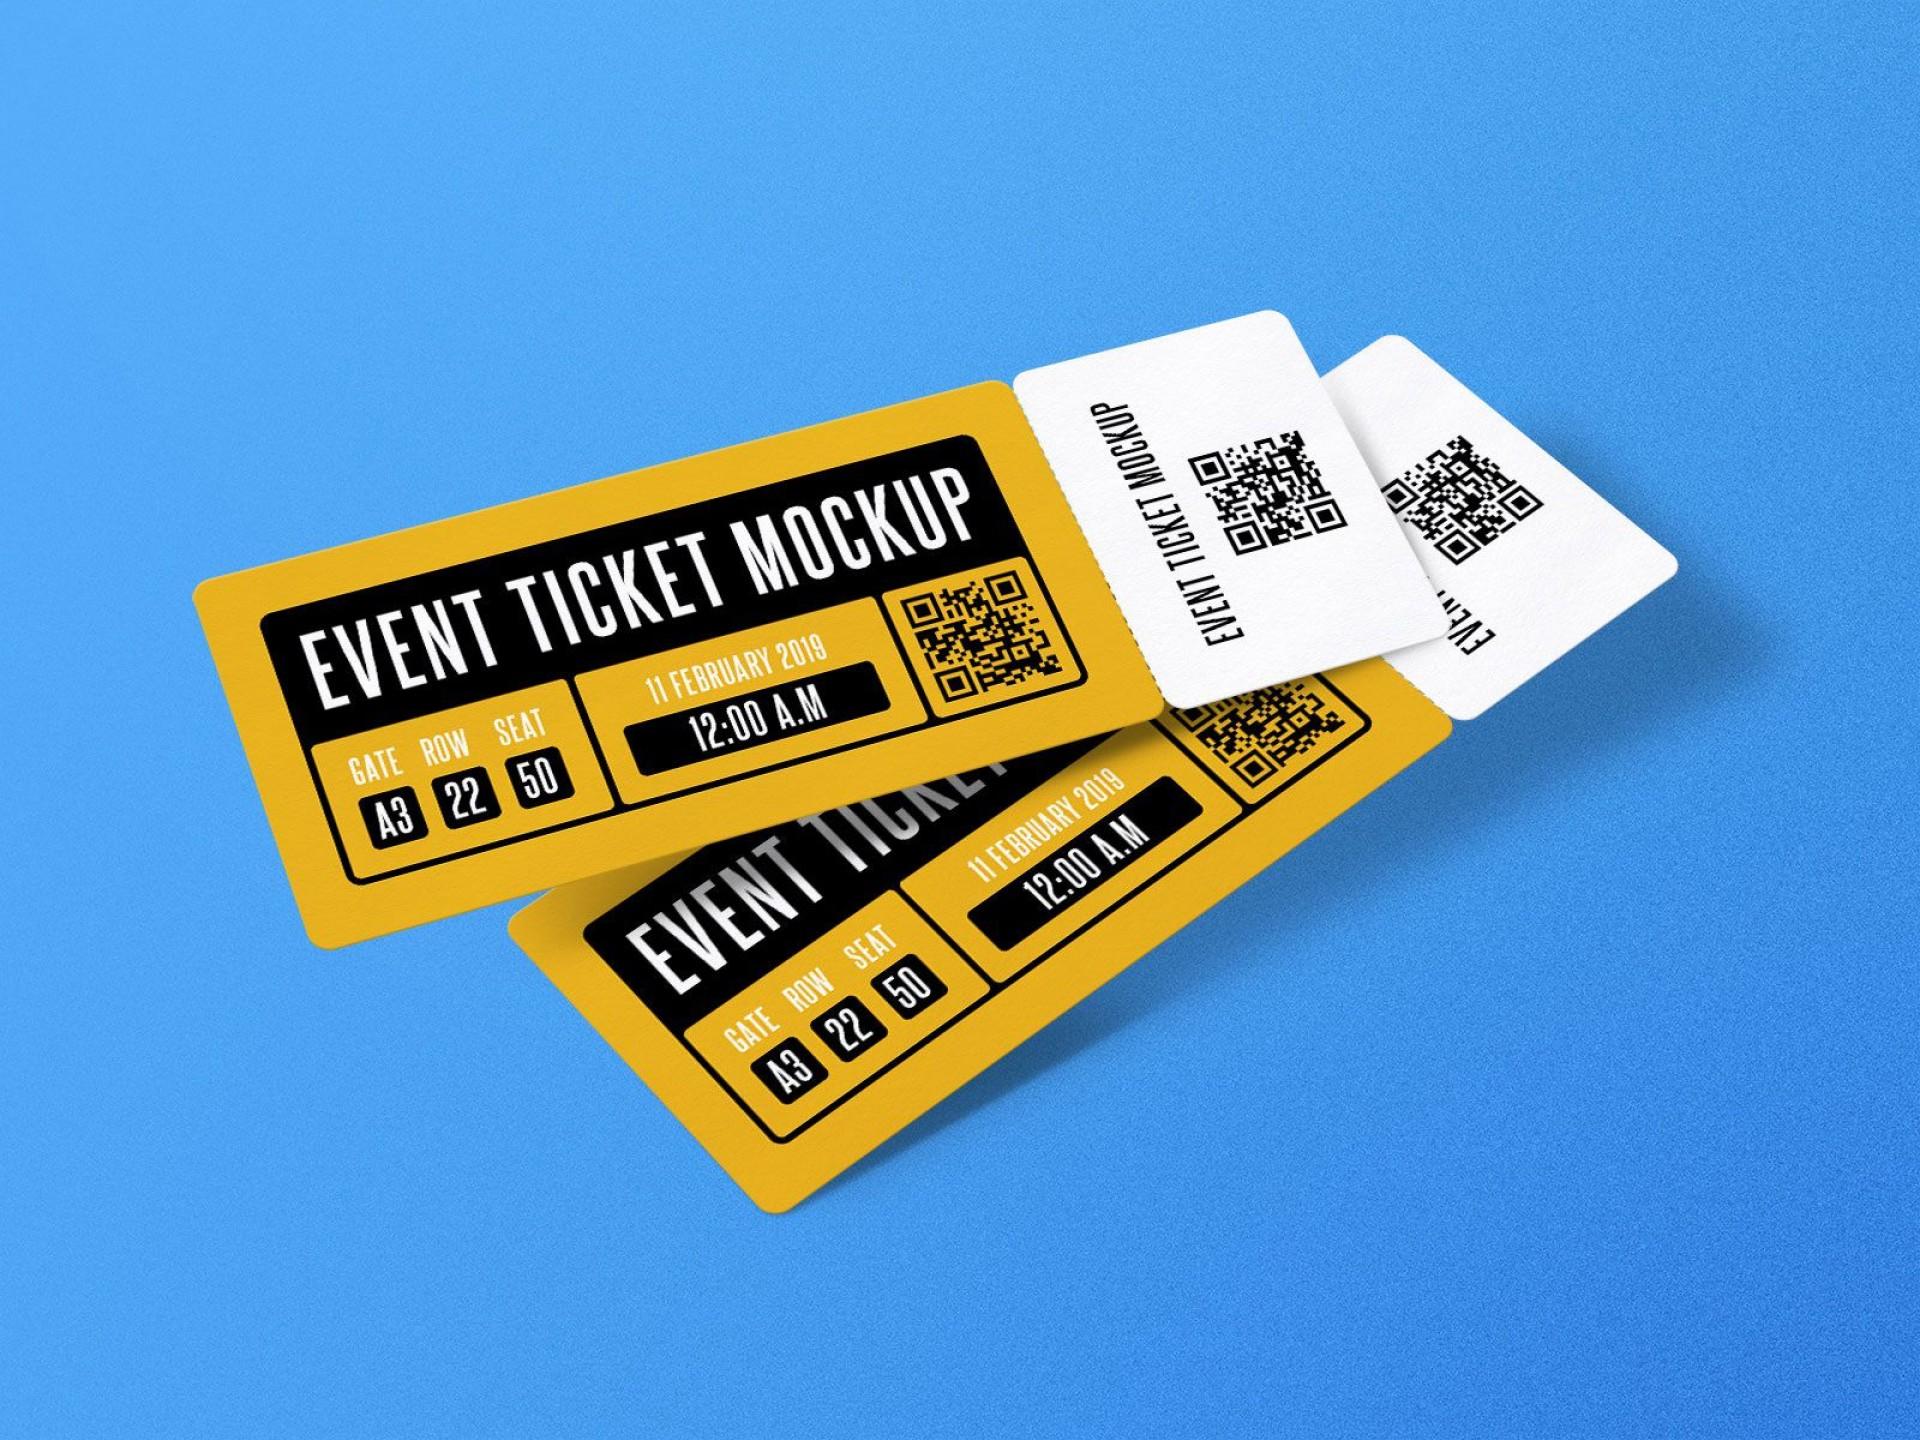 007 Shocking Event Ticket Template Photoshop High Def  Design Psd Free Download1920